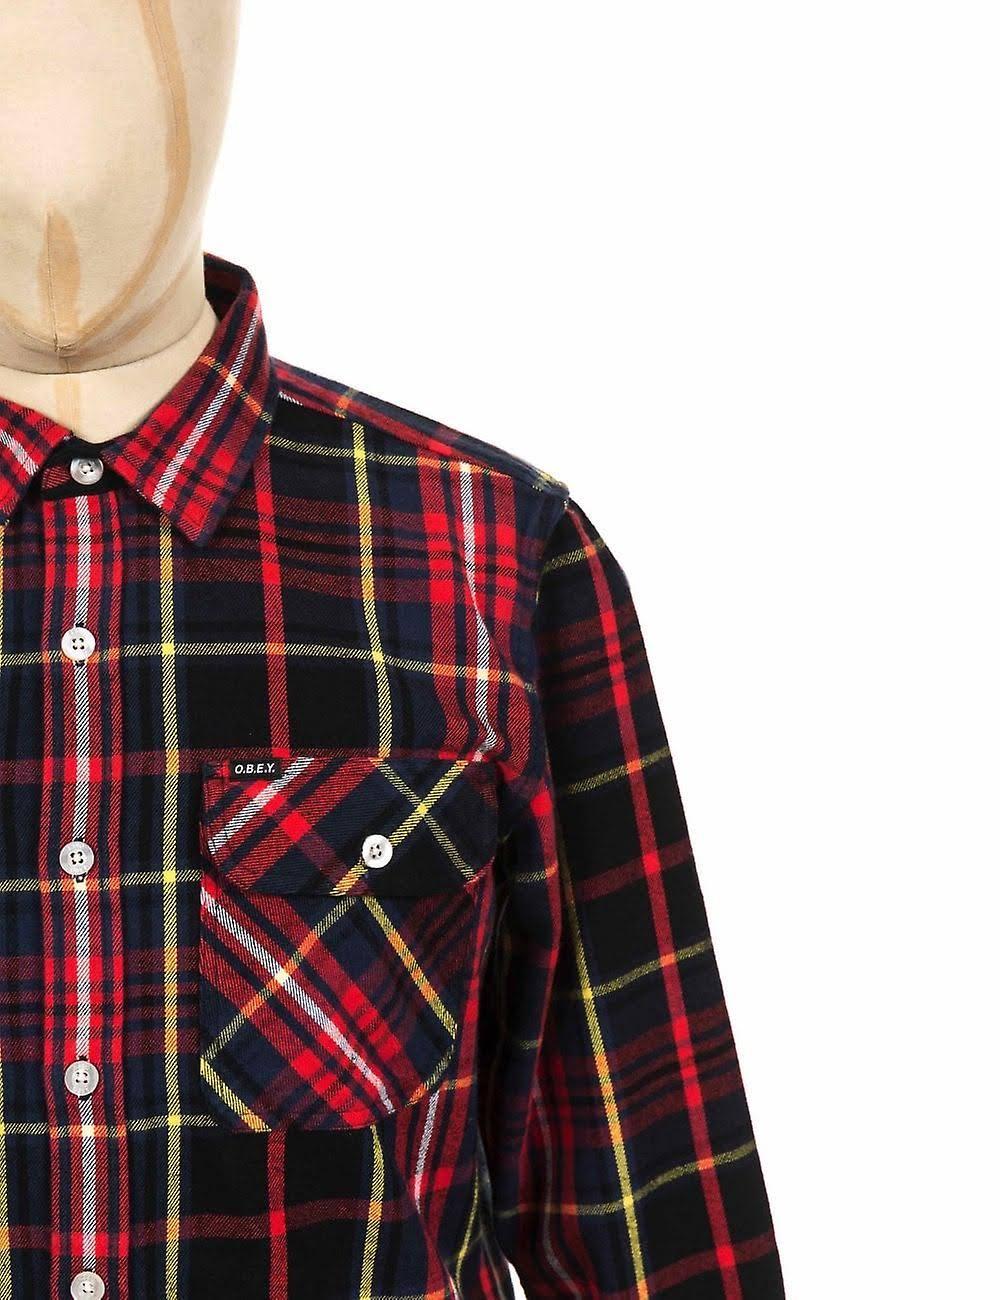 Obedecer Grande Franela Ropa Nelson Camisa De Negro Multi OZwfxOzrq